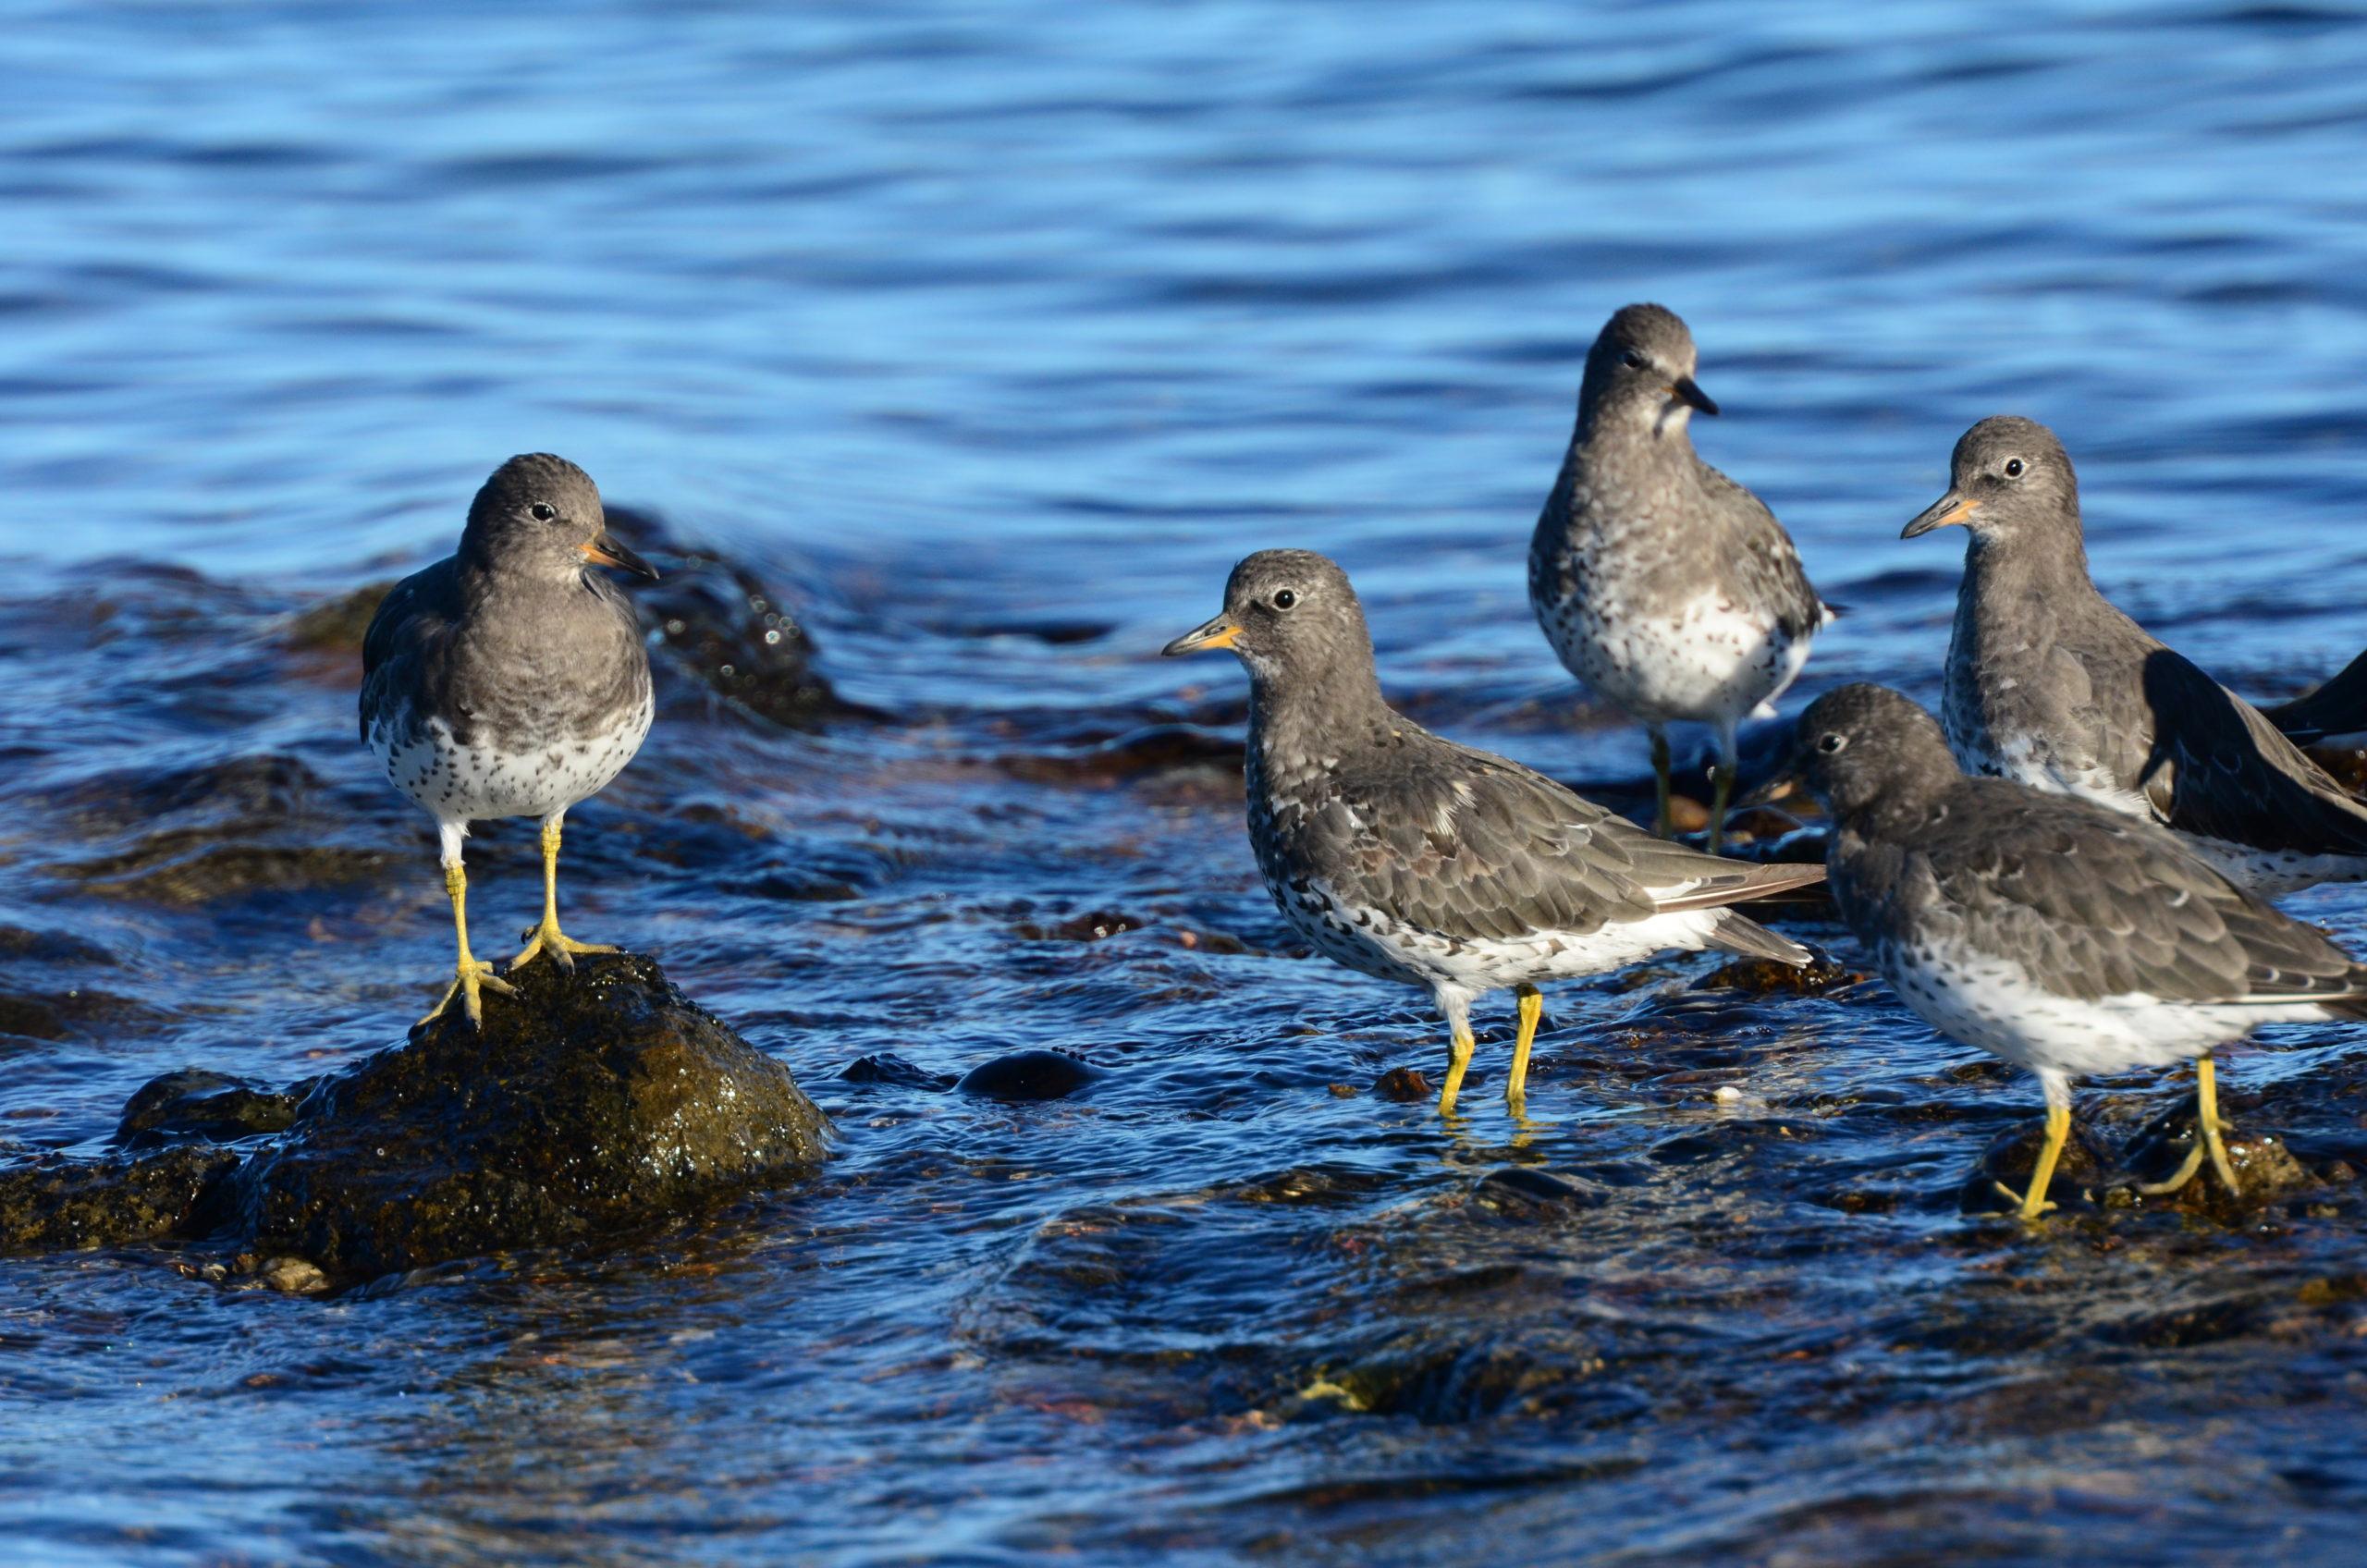 Grey and yellow surfbirds standing on shoreline rocks